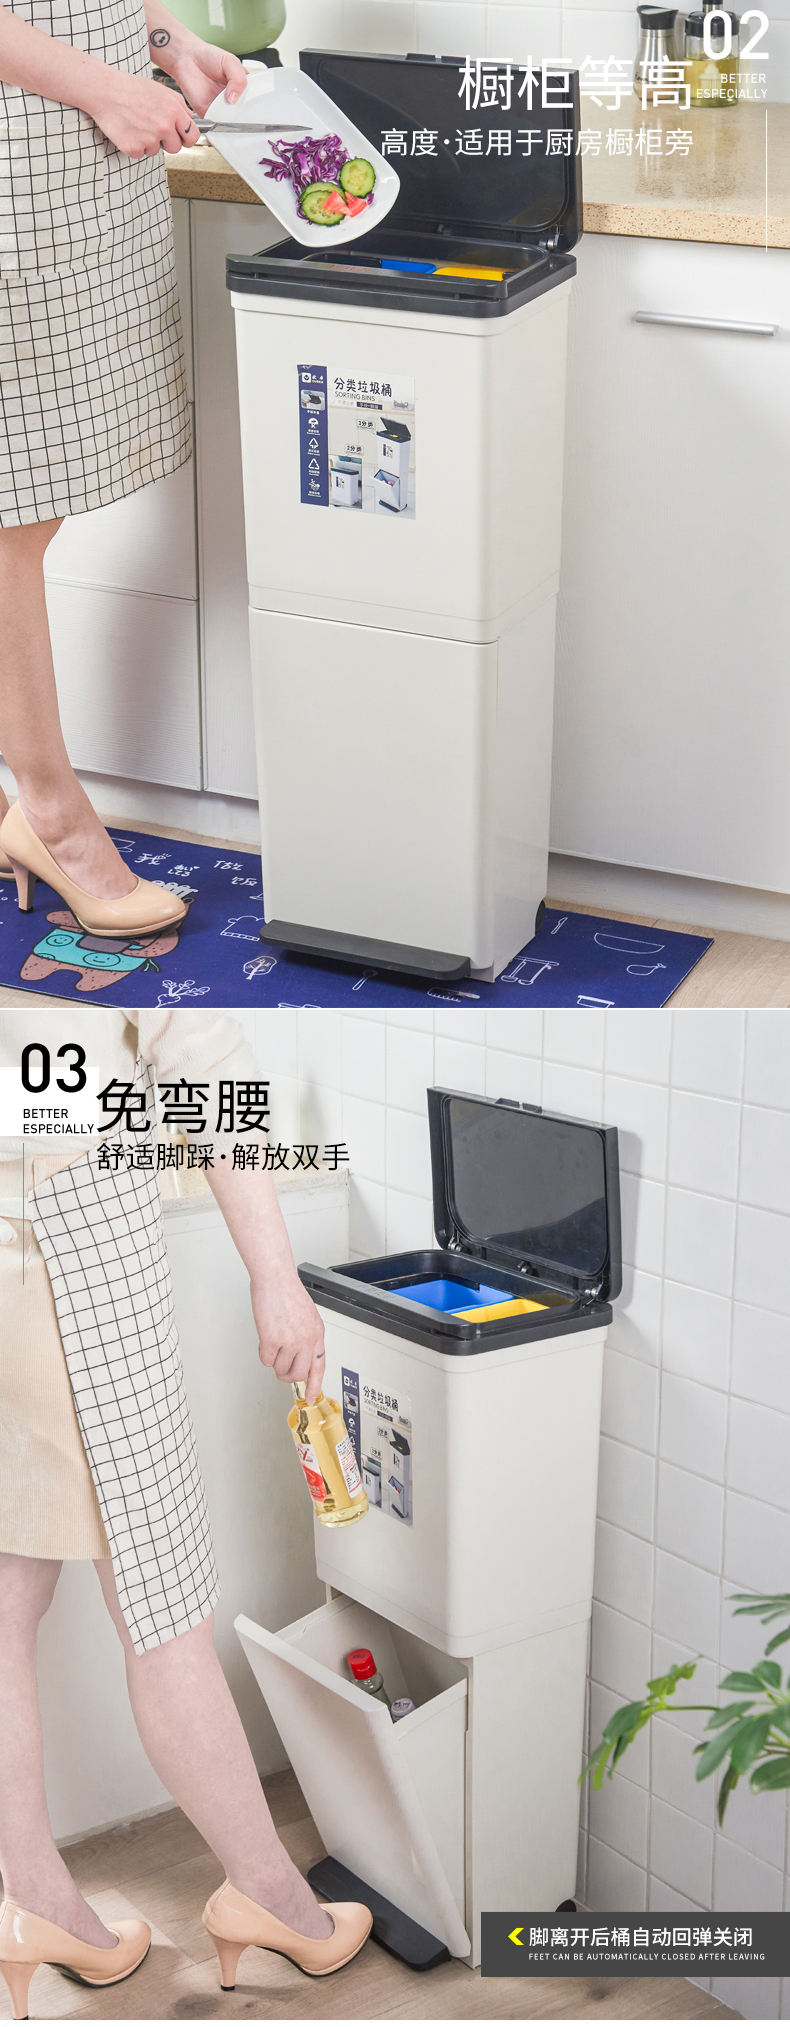 recipiente poubelle salle de bain reciclagem bin